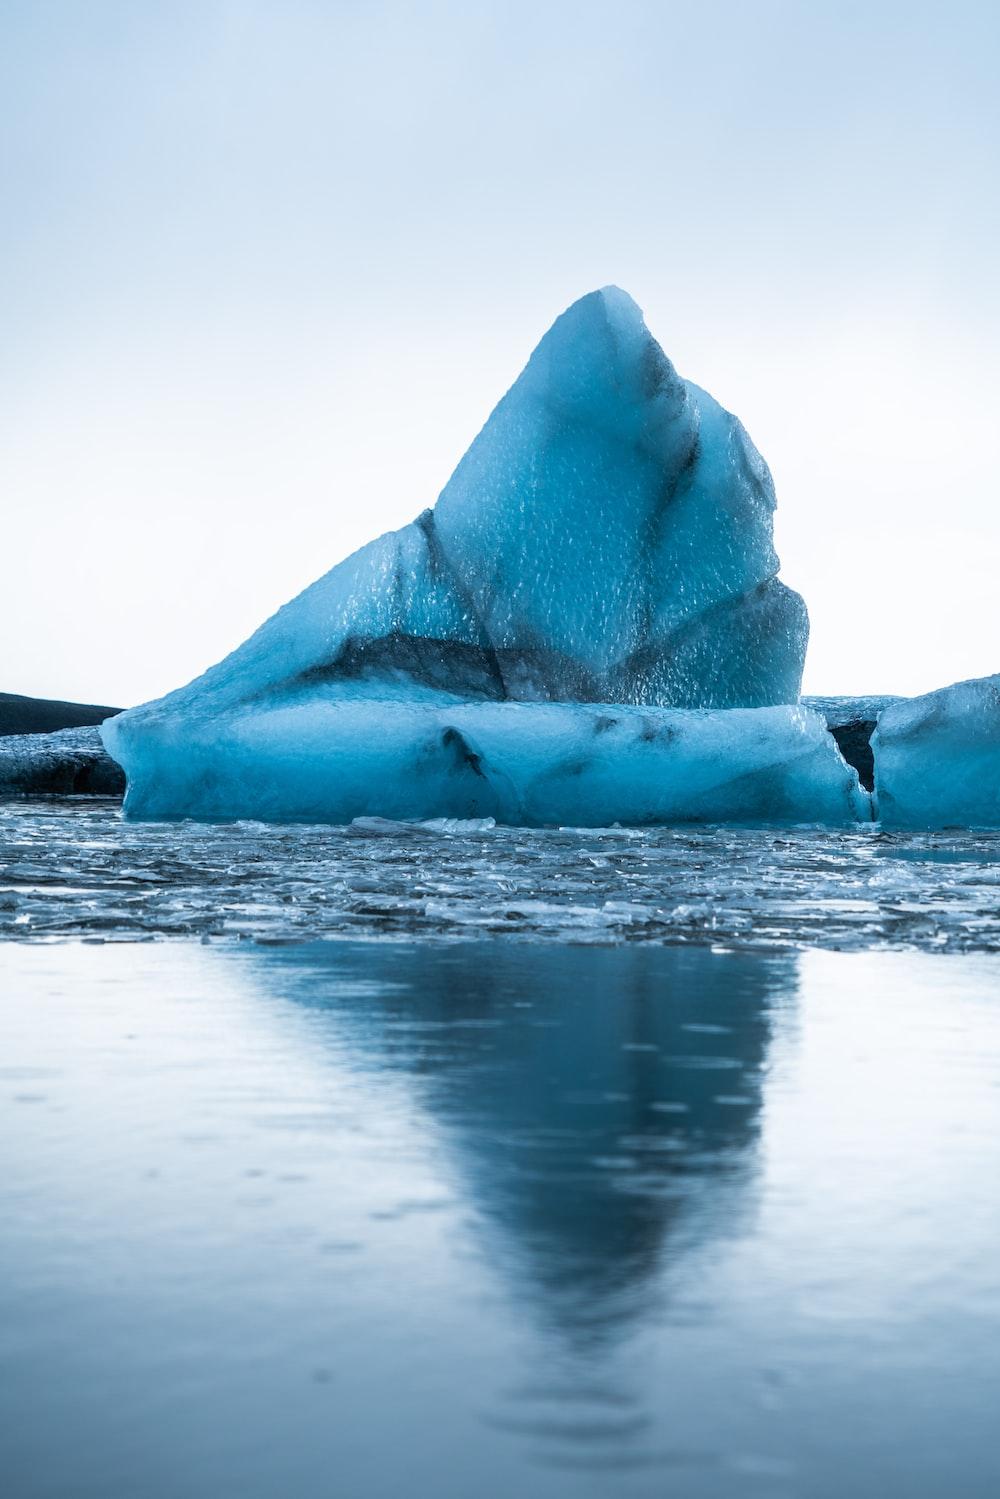 glacier on sea during daytime